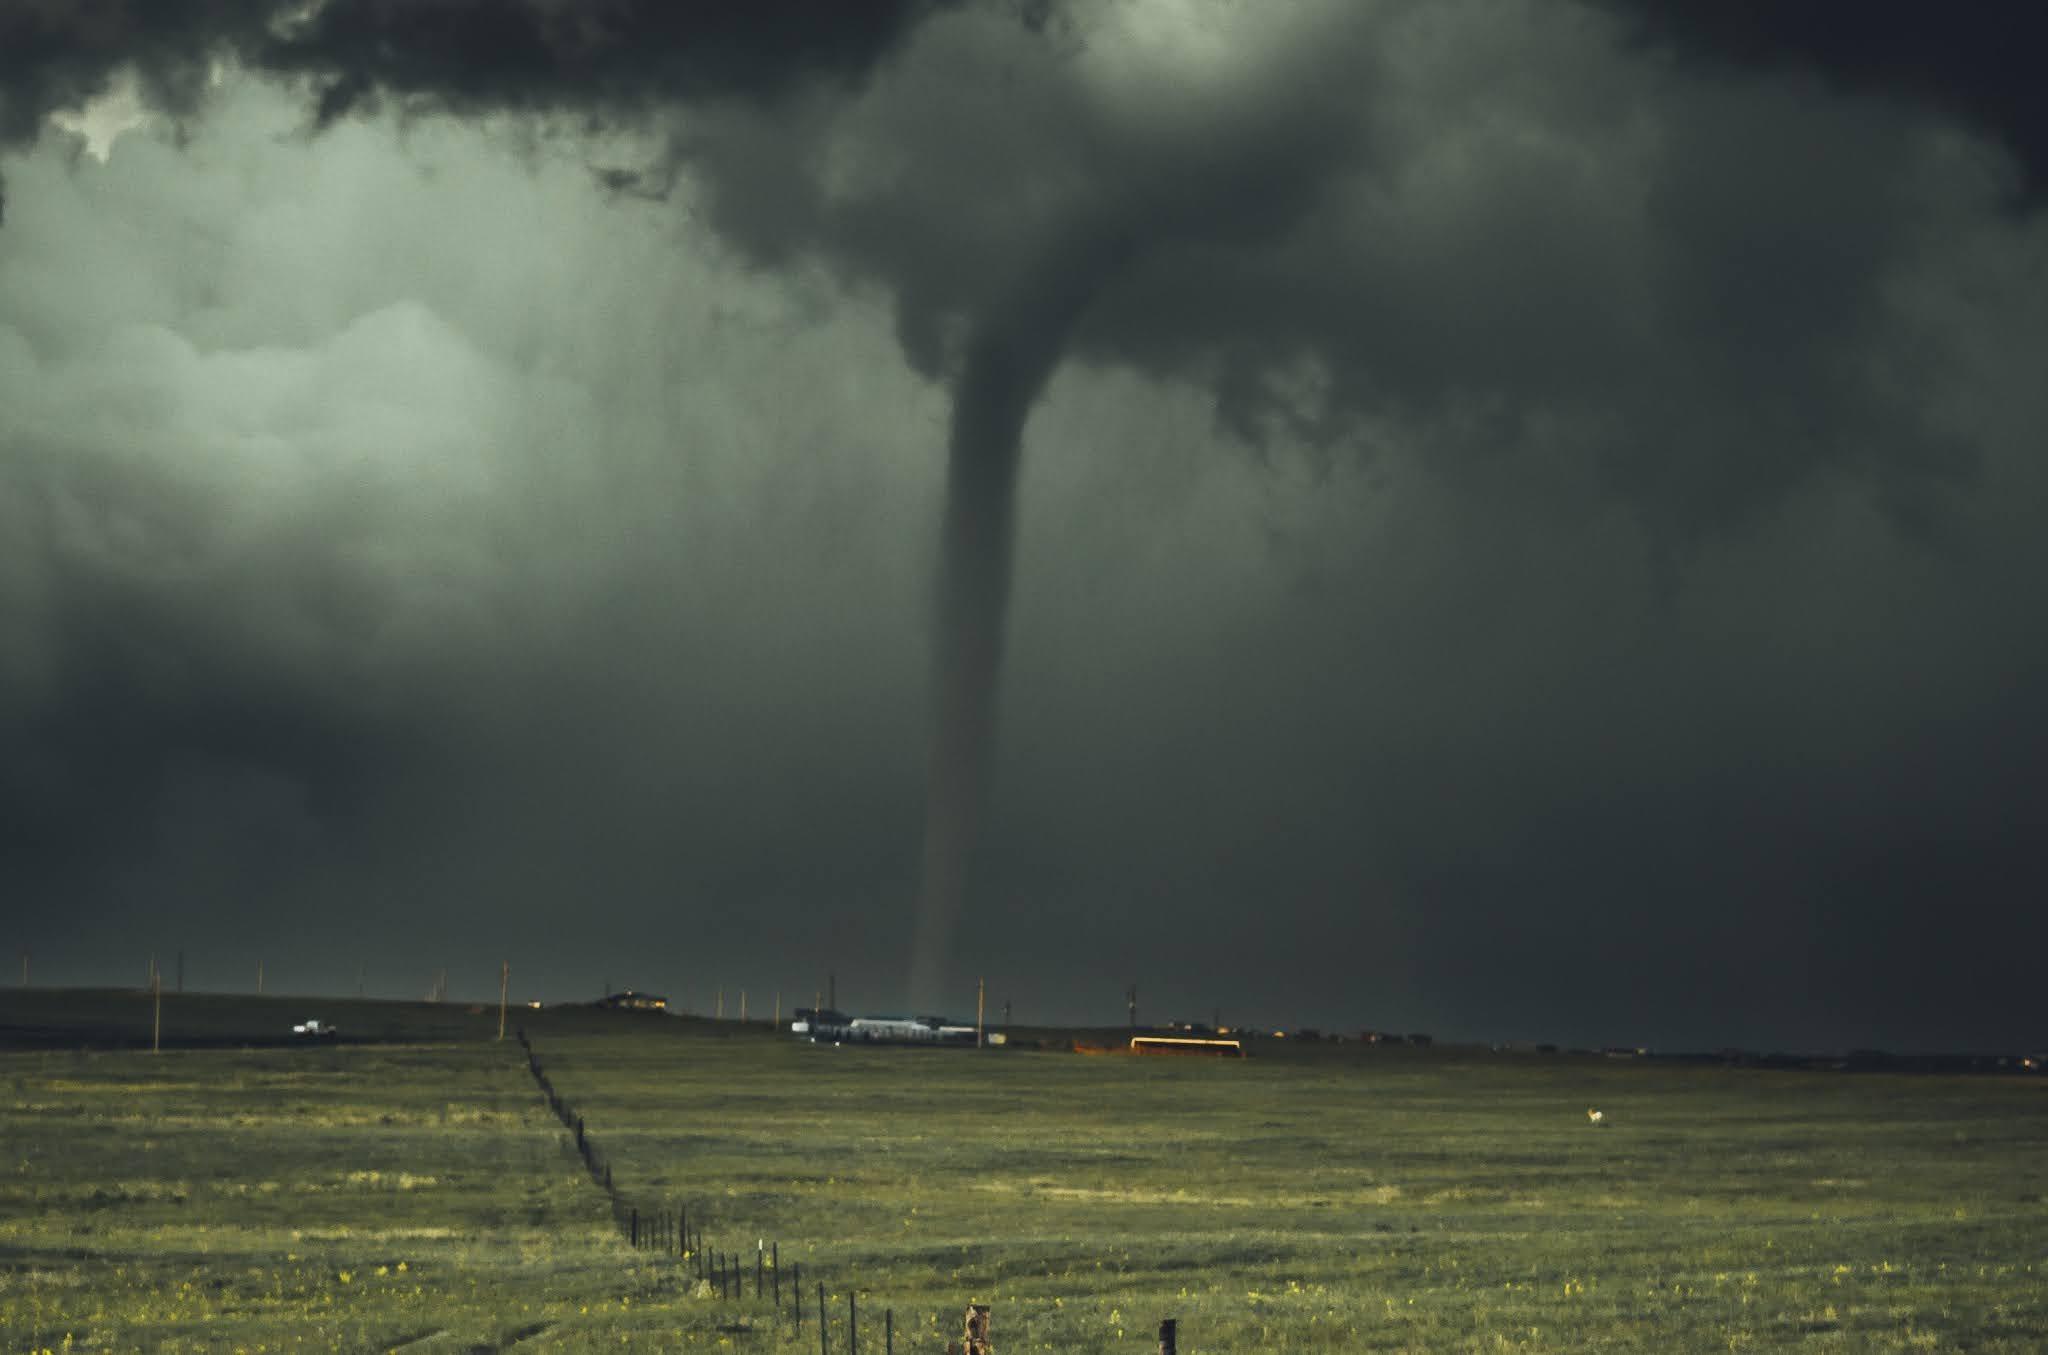 tornado, cyclone, hurricane, typhoon, twister, waterspout, whirlwind, dustdevil